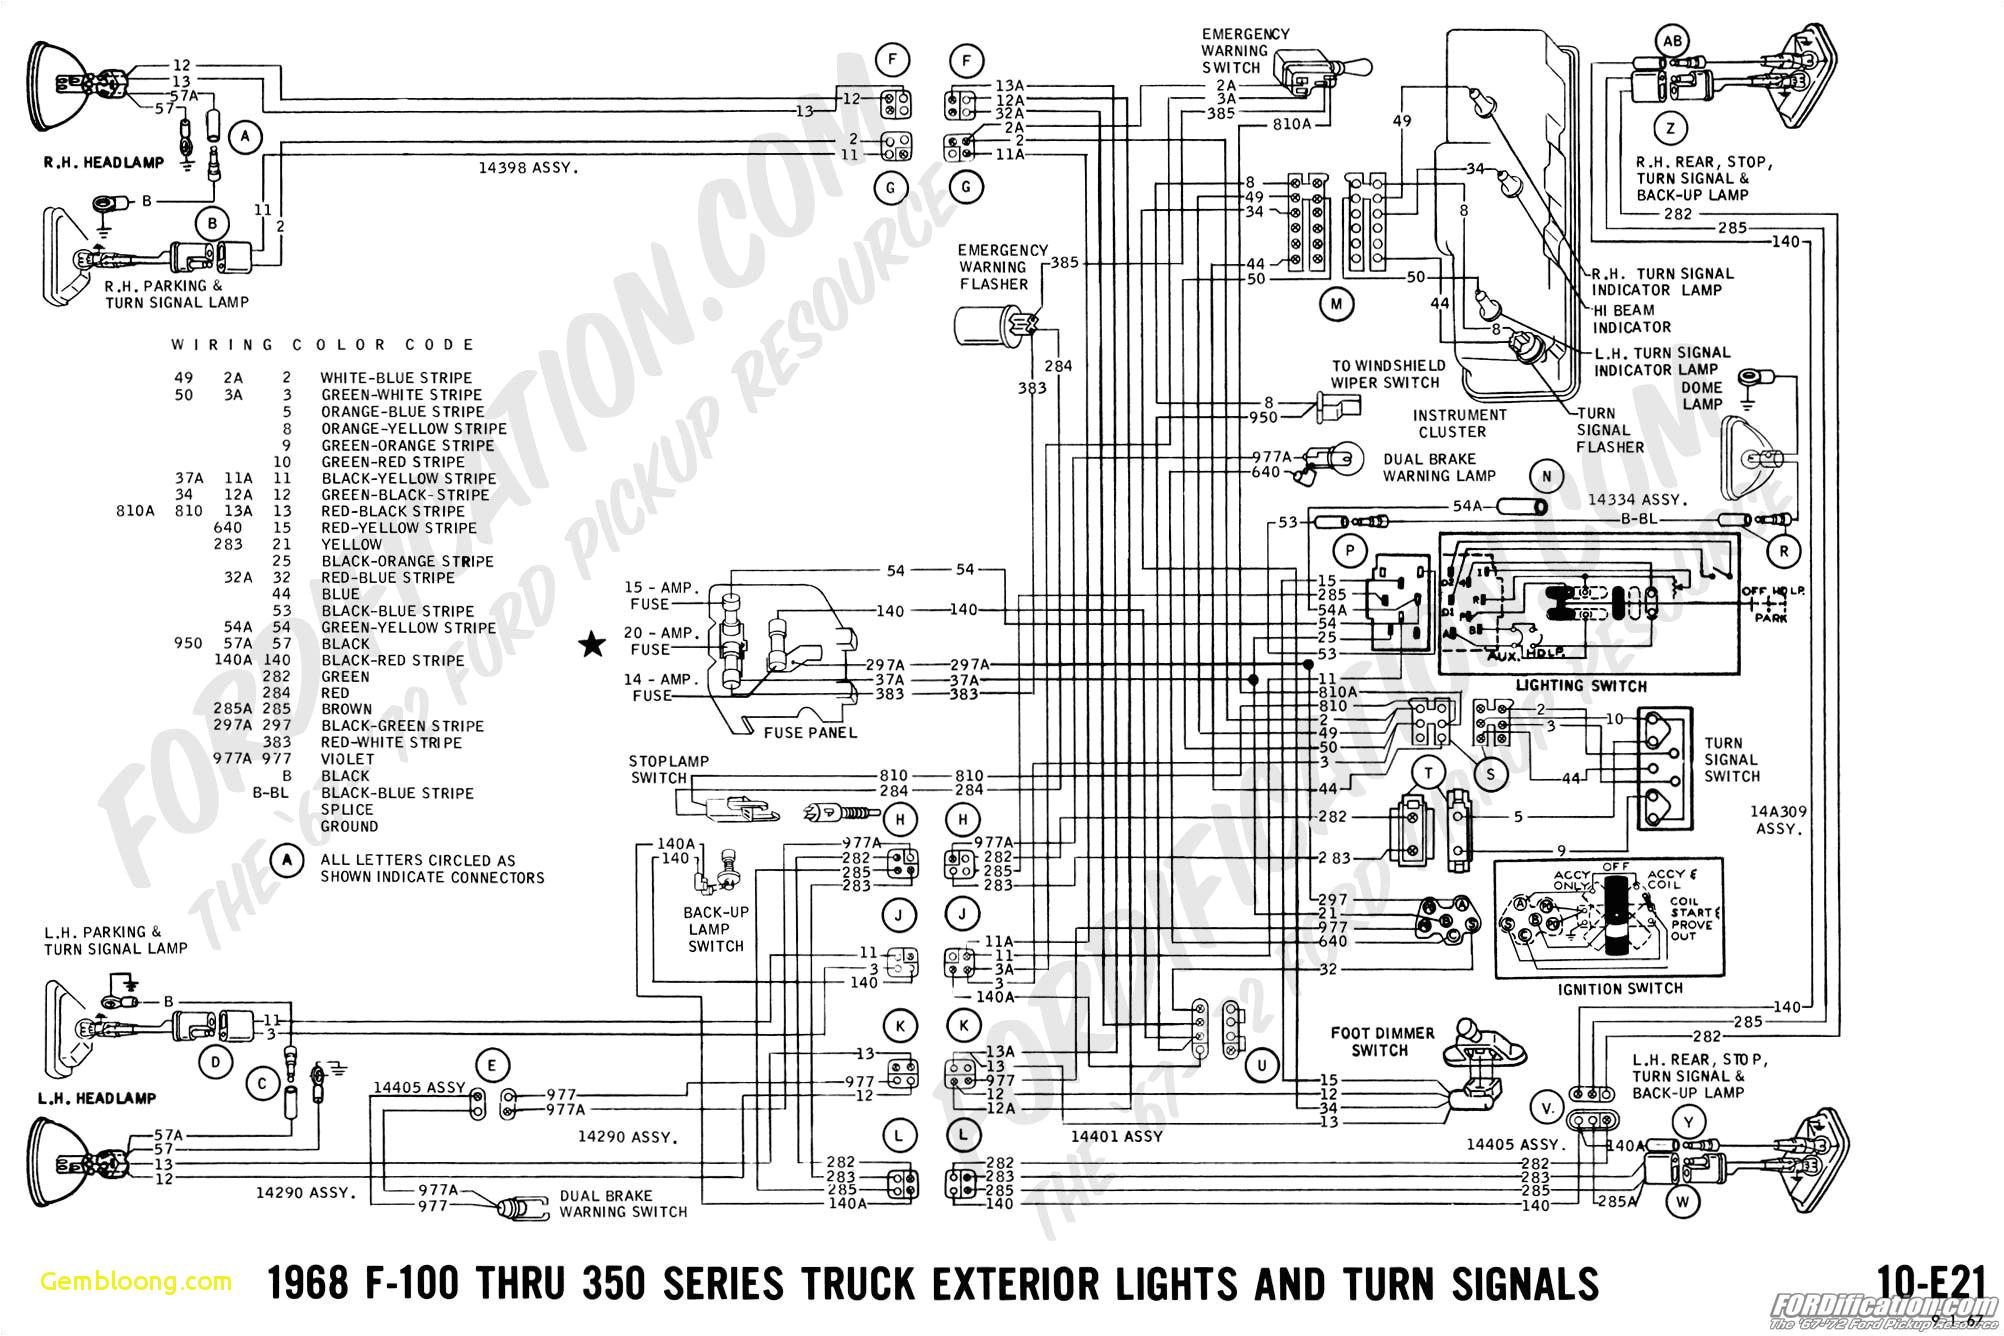 1968 ford f100 turn signal wiring diagram wiring diagram tags 1967 f 100 wiring harness wiring